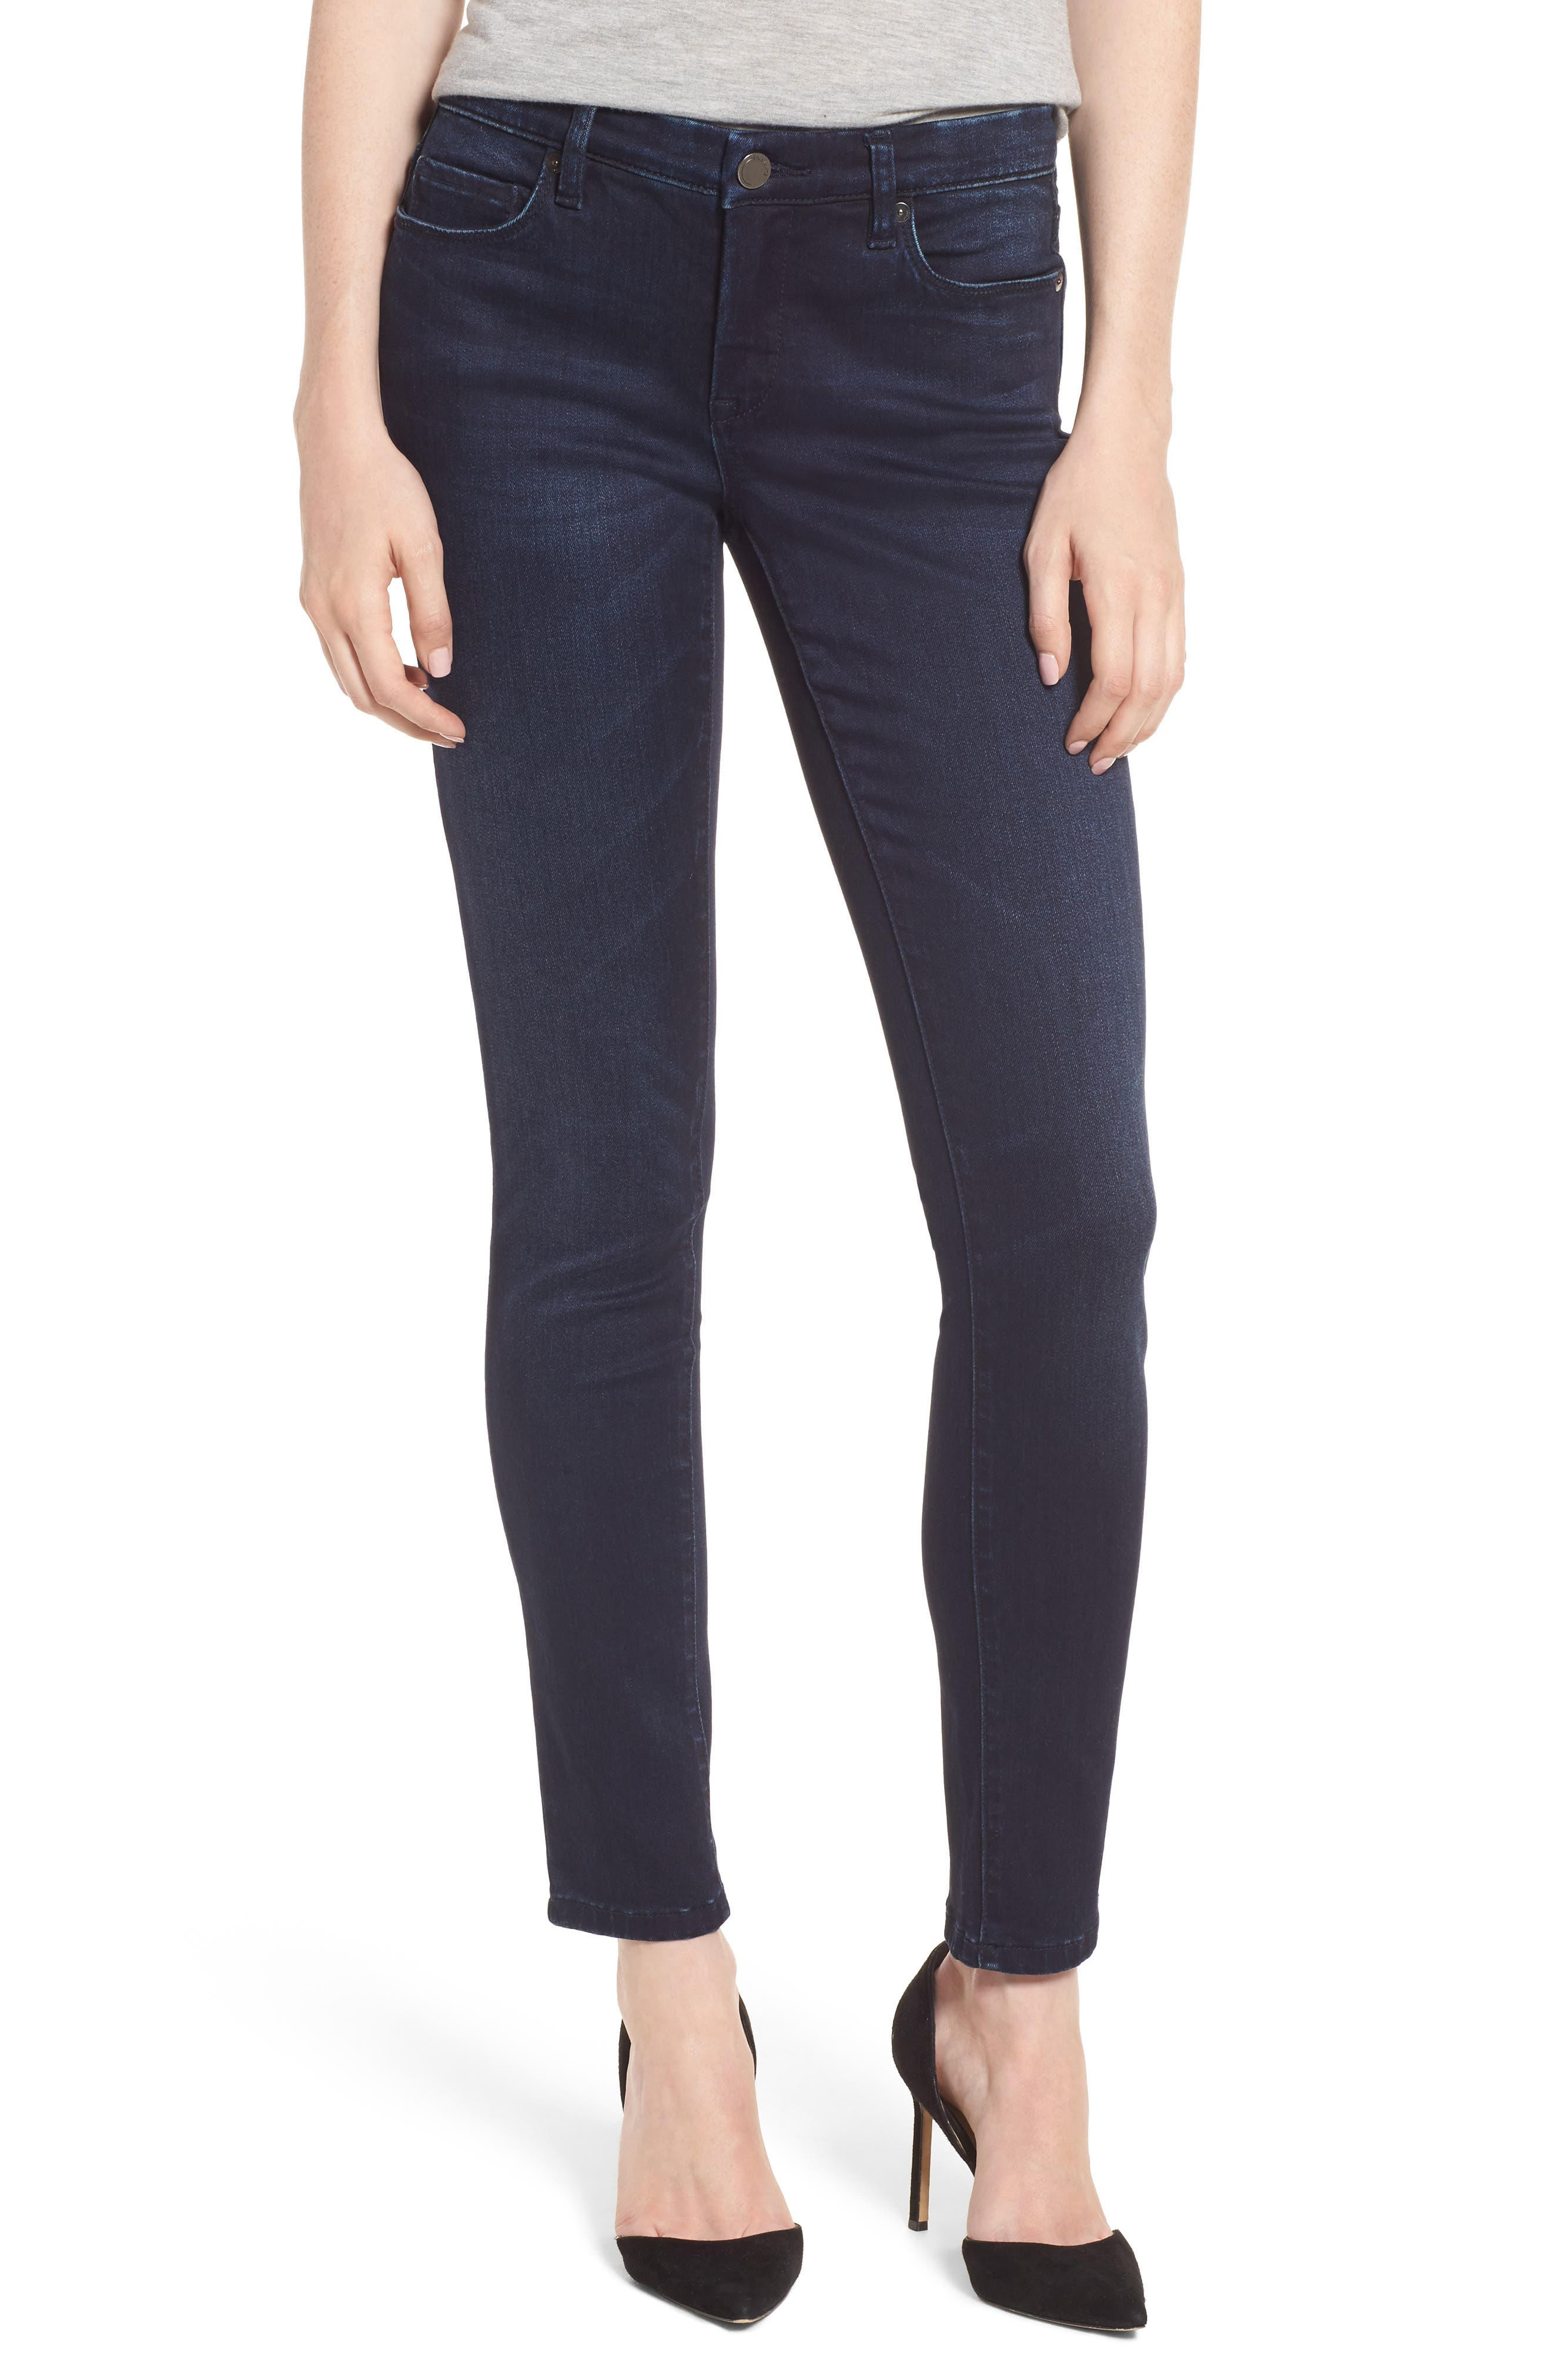 BLANKNYC Stretch Skinny Jeans (Junk Brain)